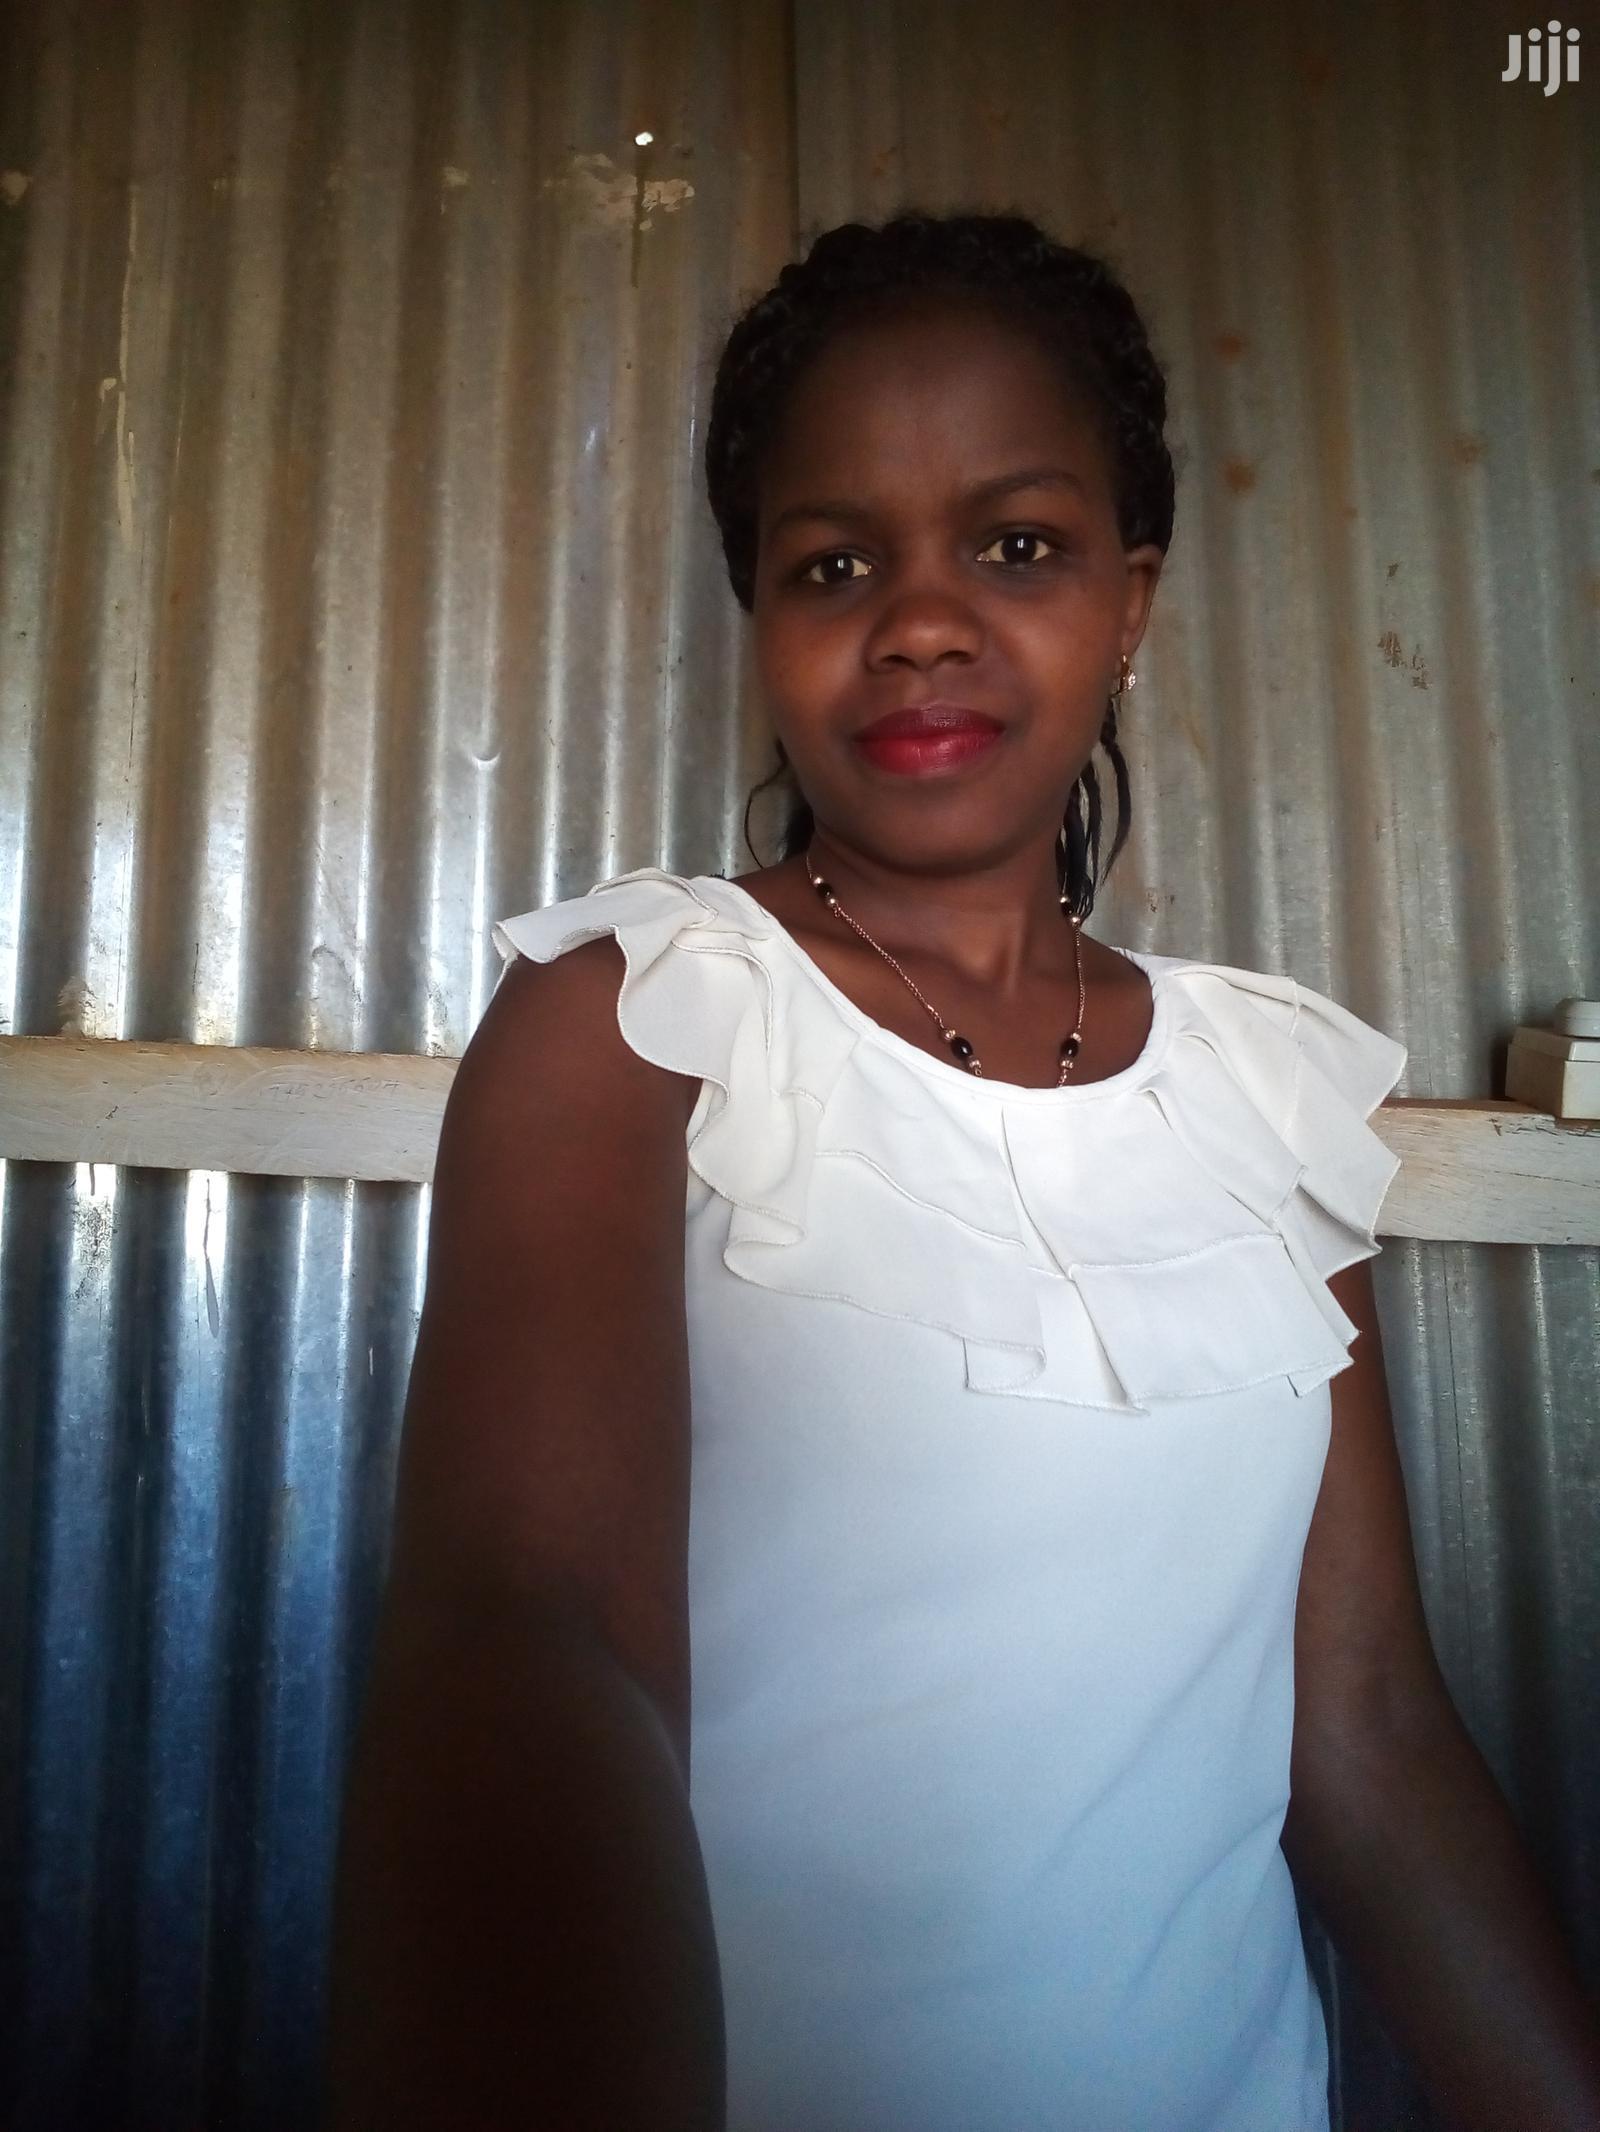 Job Opportunities For Form Four Leavers | Accounting & Finance CVs for sale in Lanet/Umoja, Nakuru, Kenya